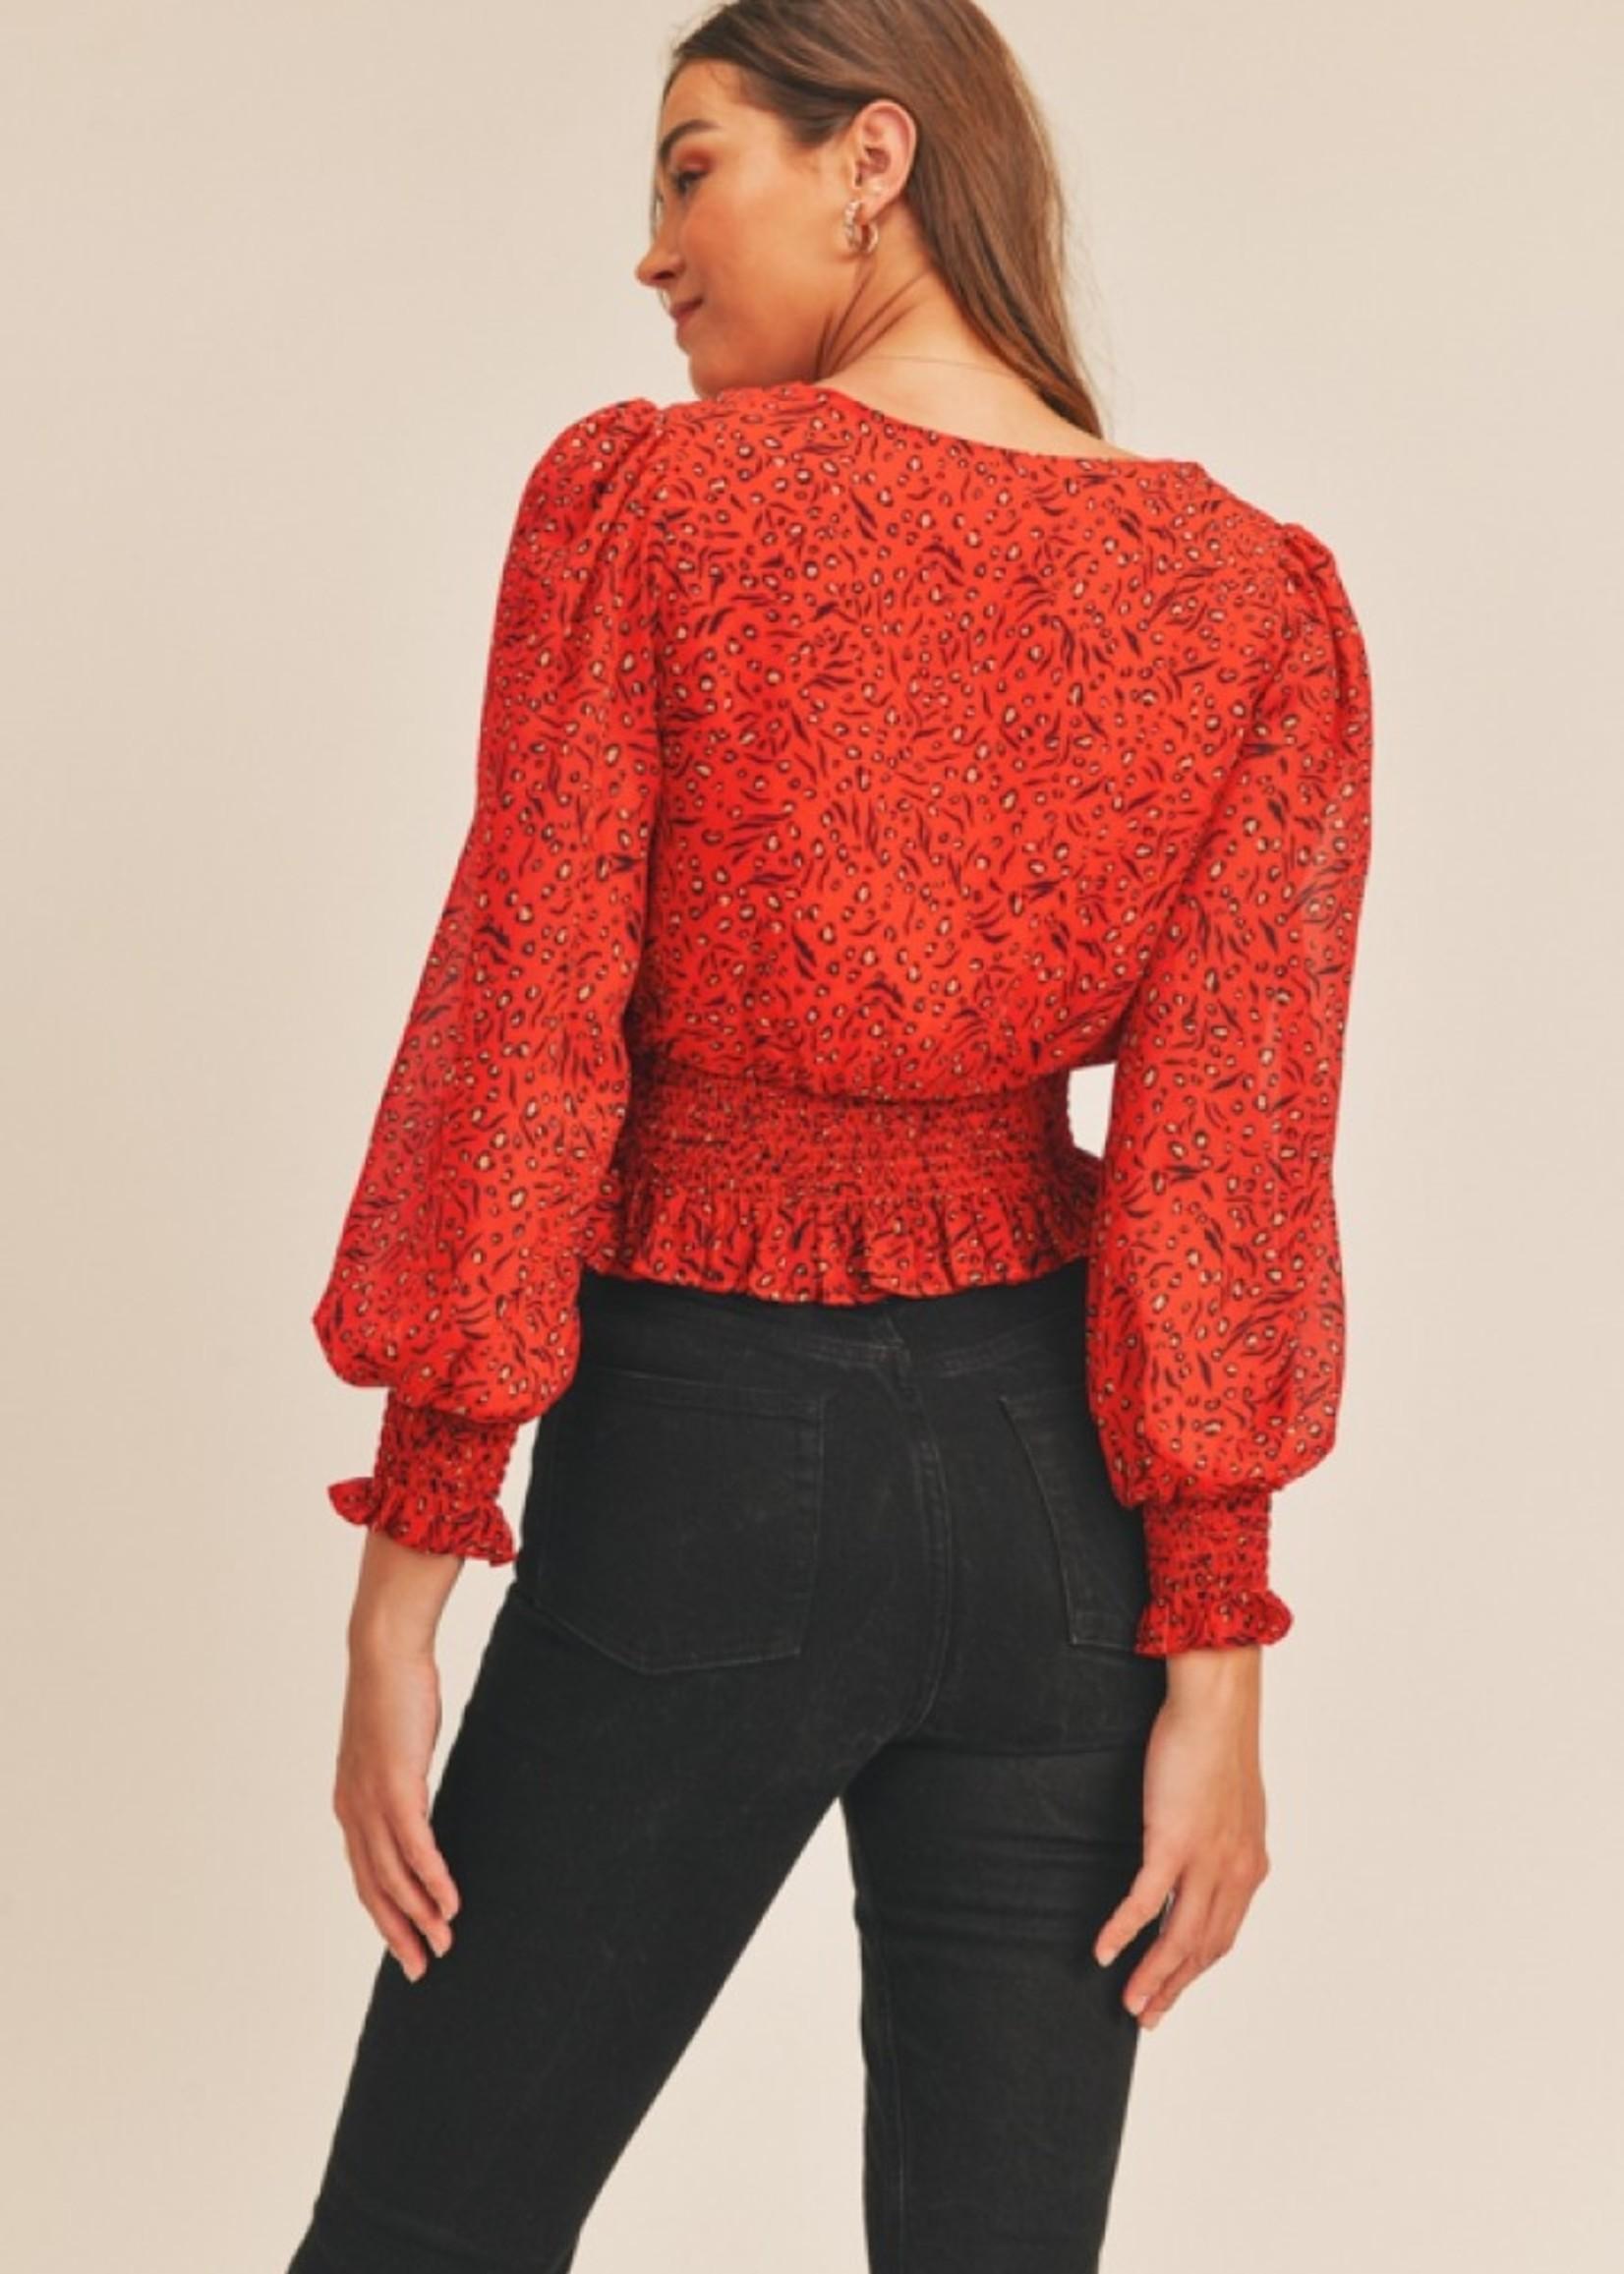 lush lush sly blouse